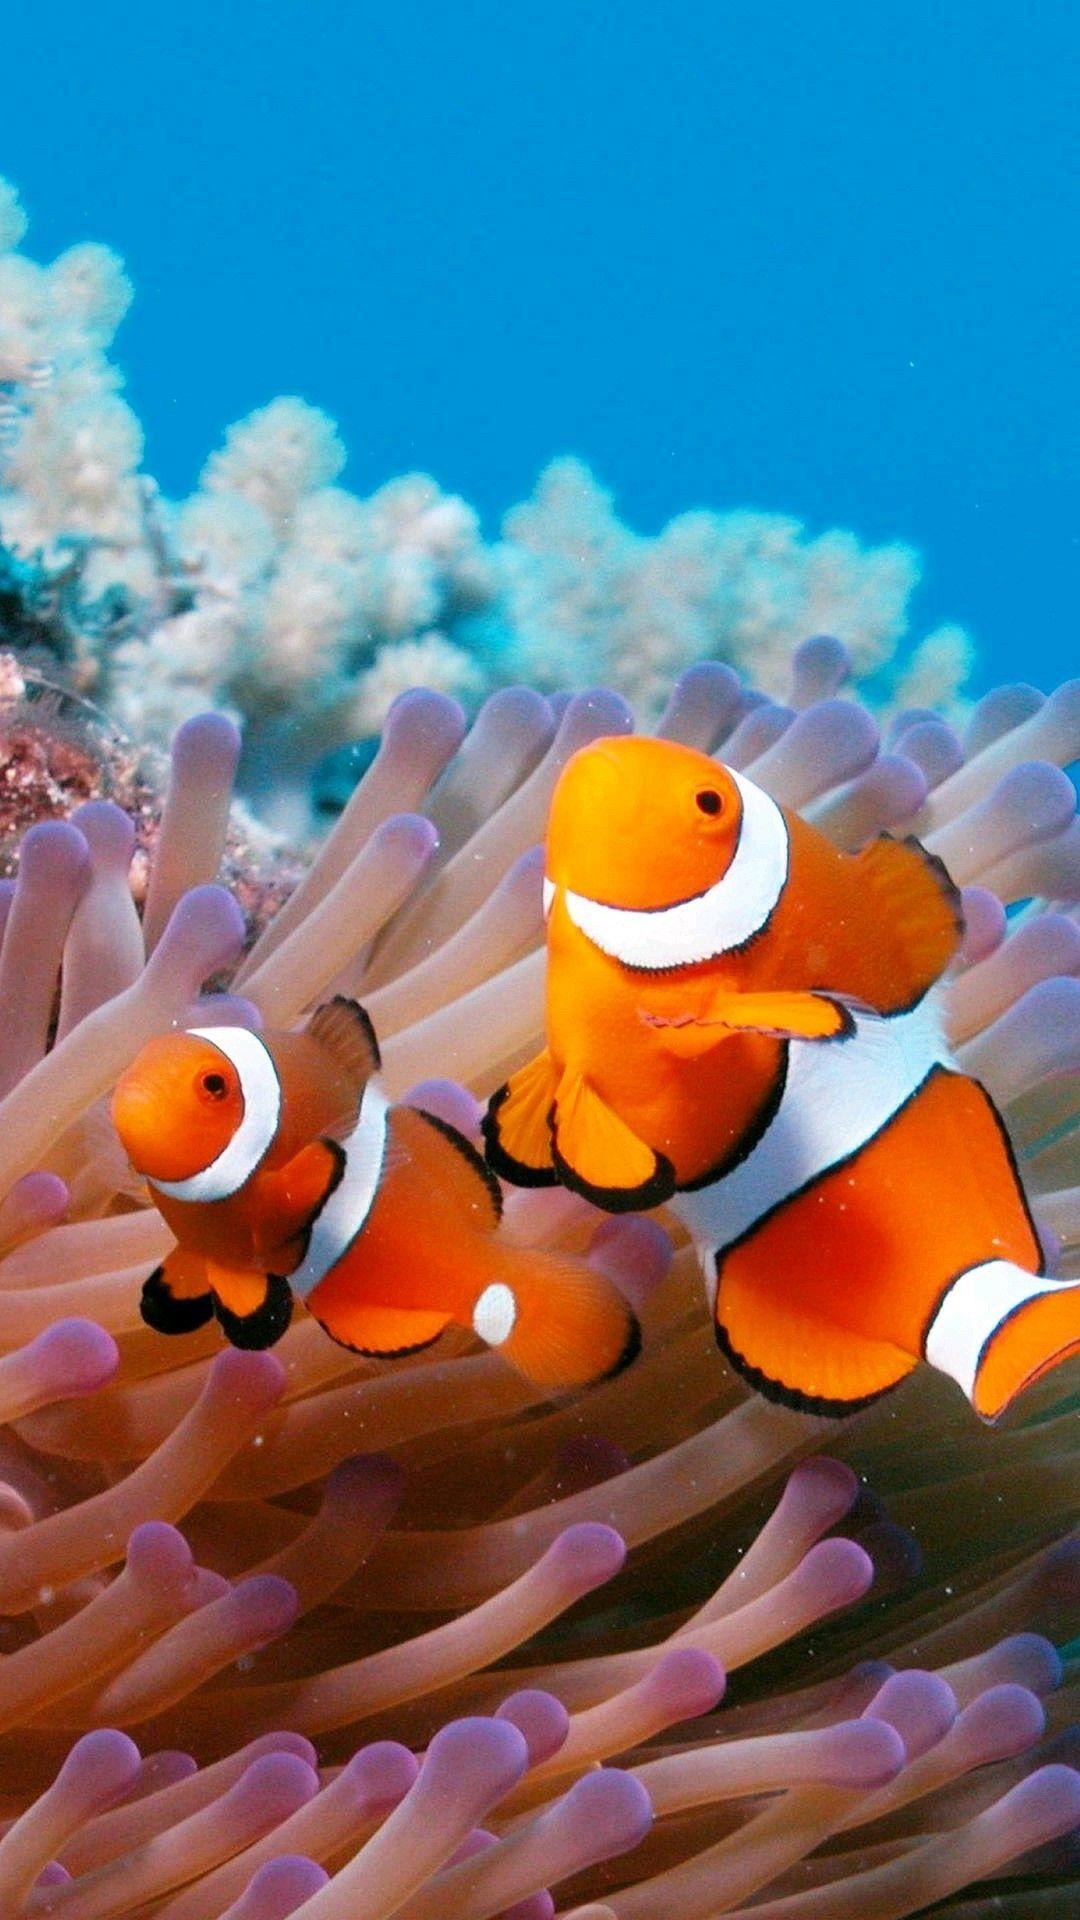 Clown Fish Clown Fish Clownfish And Sea Anemone Fish Wallpaper